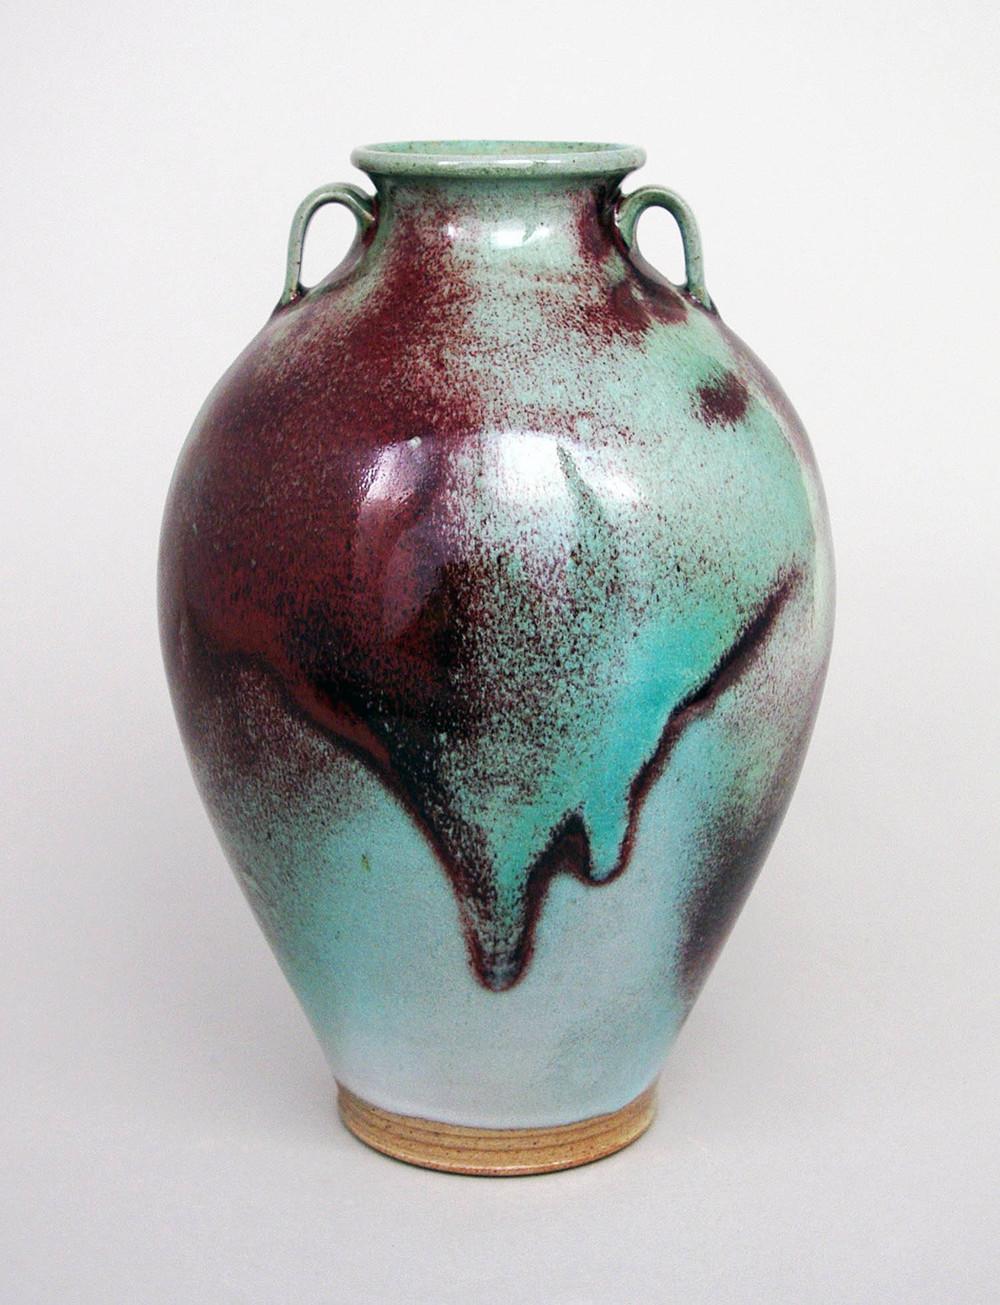 Wood Fired Chinese Blue Vase by Travis Owens.jpg